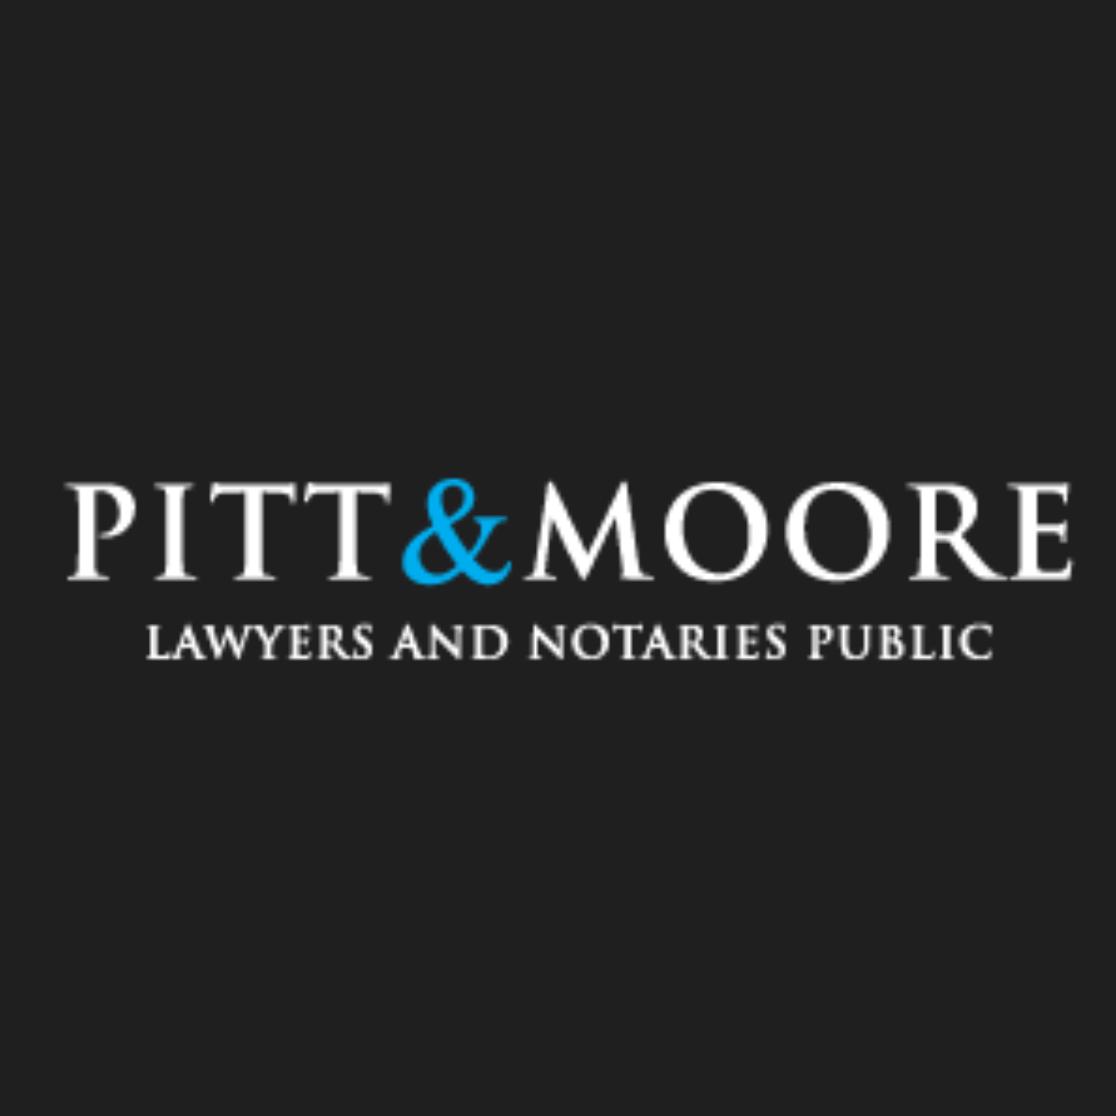 Pitt&Moore.png